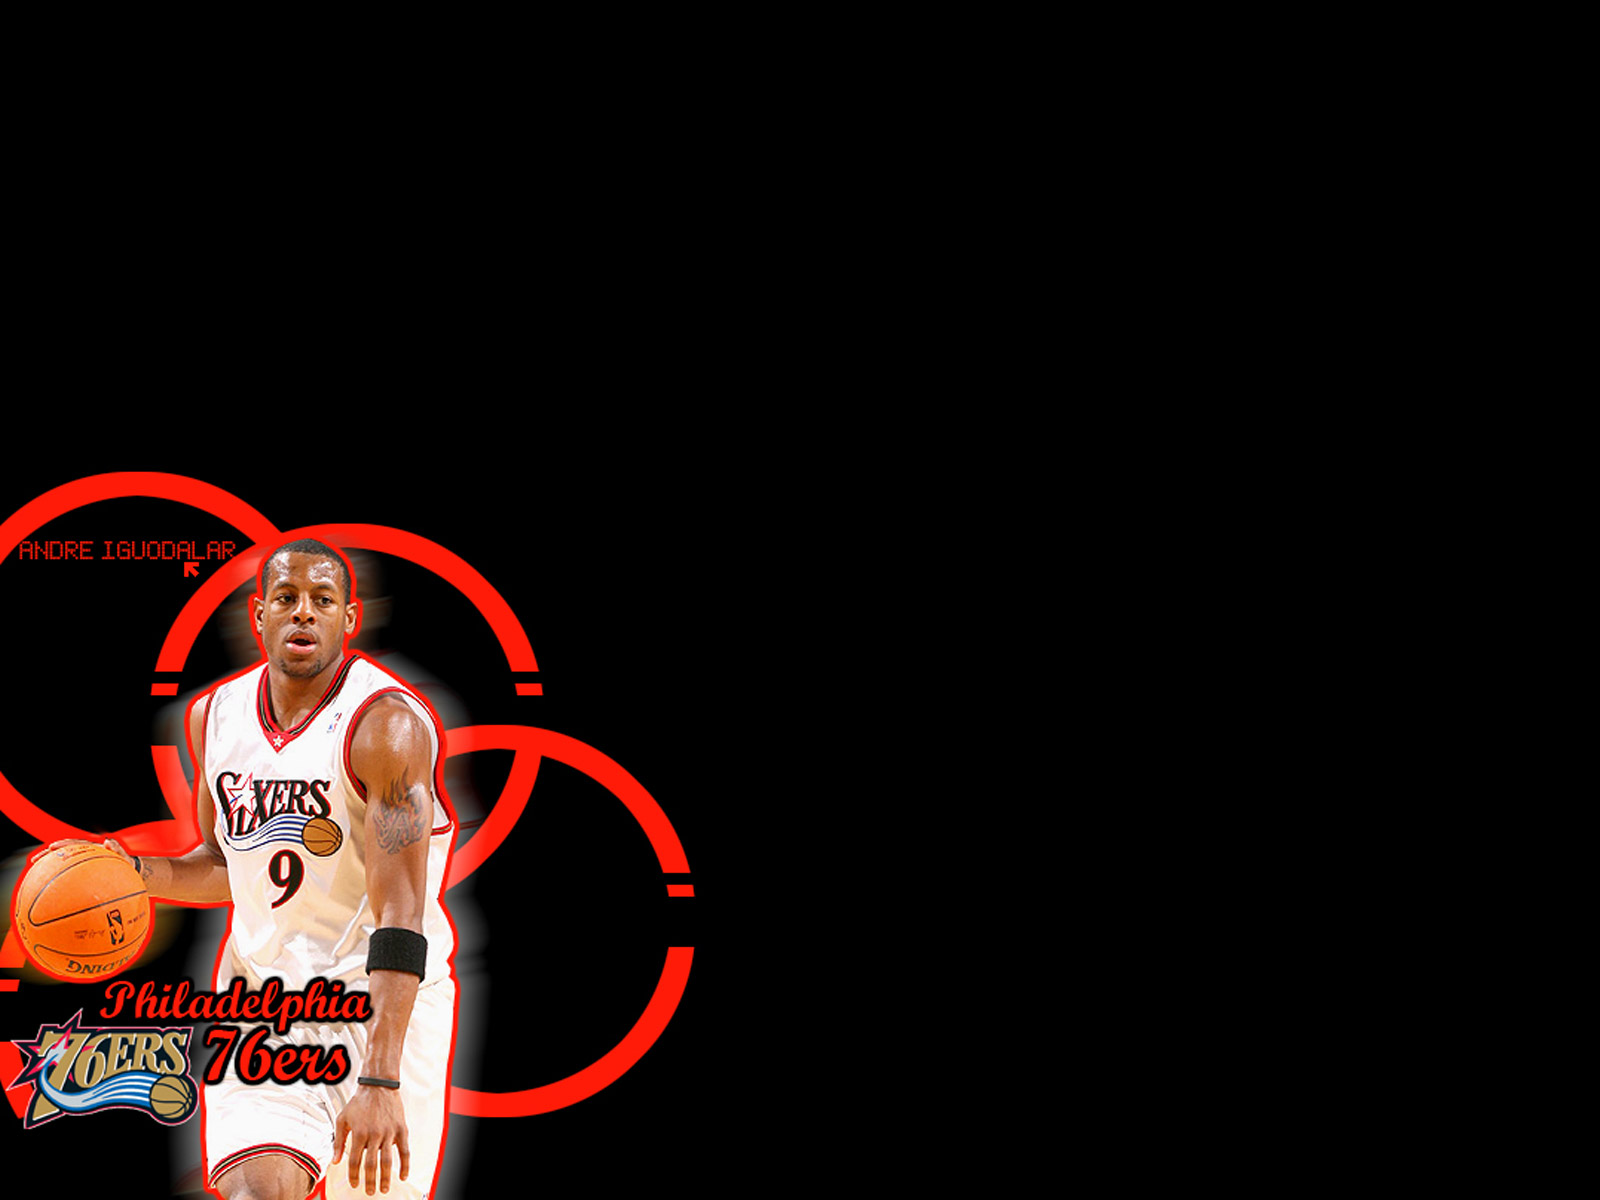 basketball wallpapers basketball wallpaper basketball background 33 1600x1200